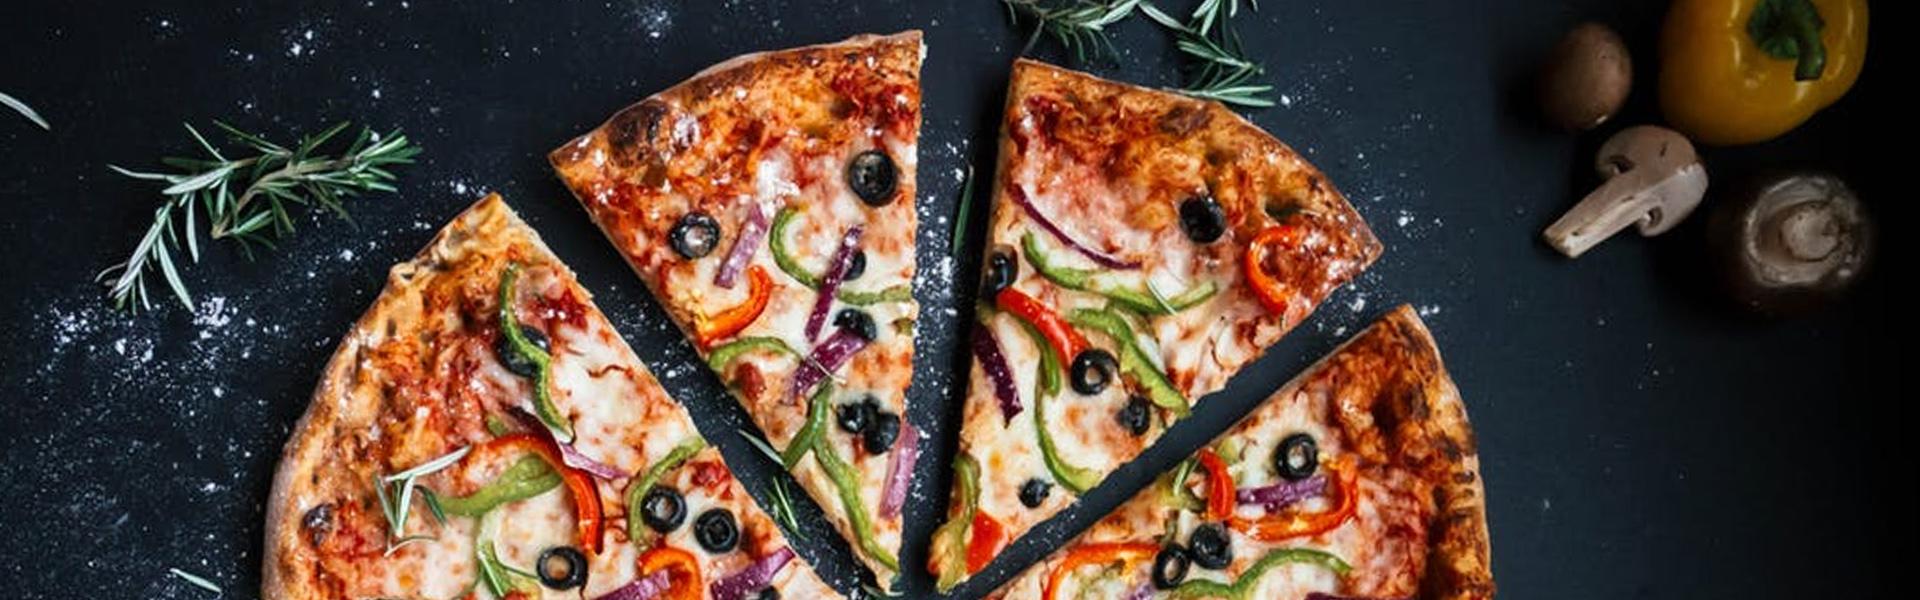 Celebrate National Pizza Day